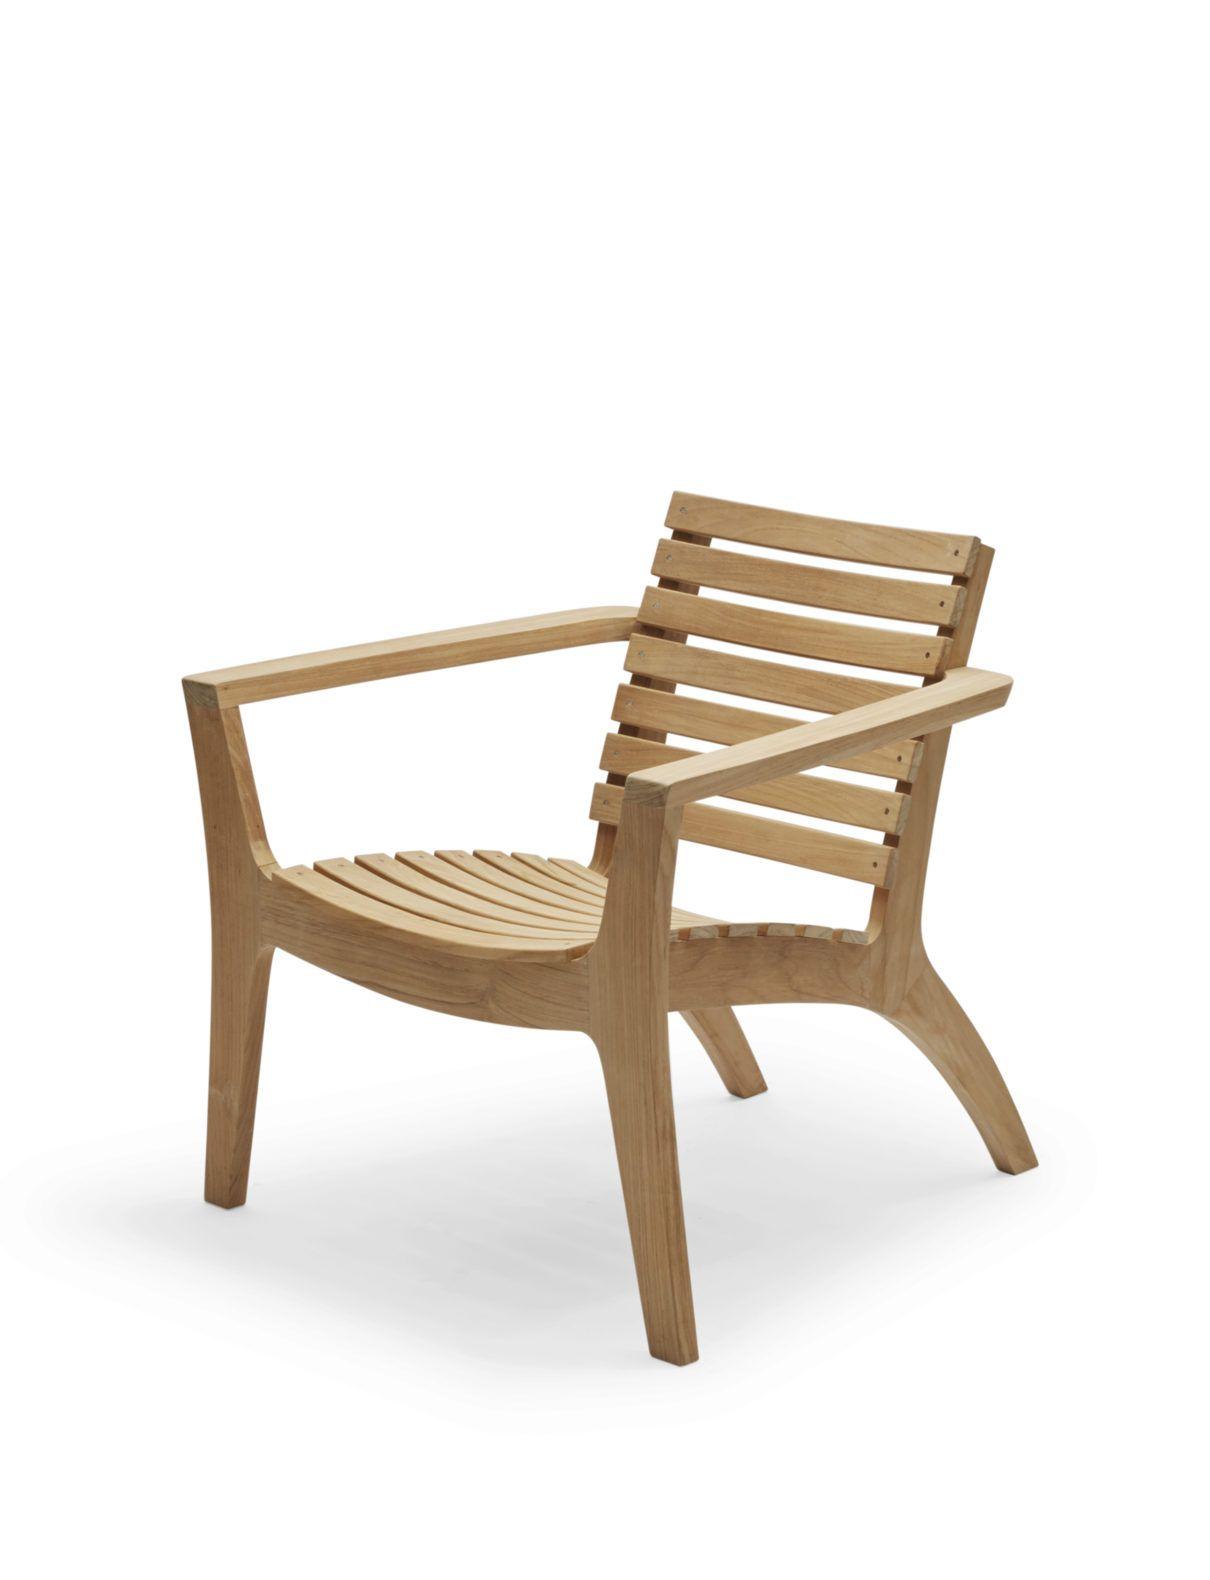 Regatta Lounge Chair Teak Buy Chair Wooden Armchair Chair